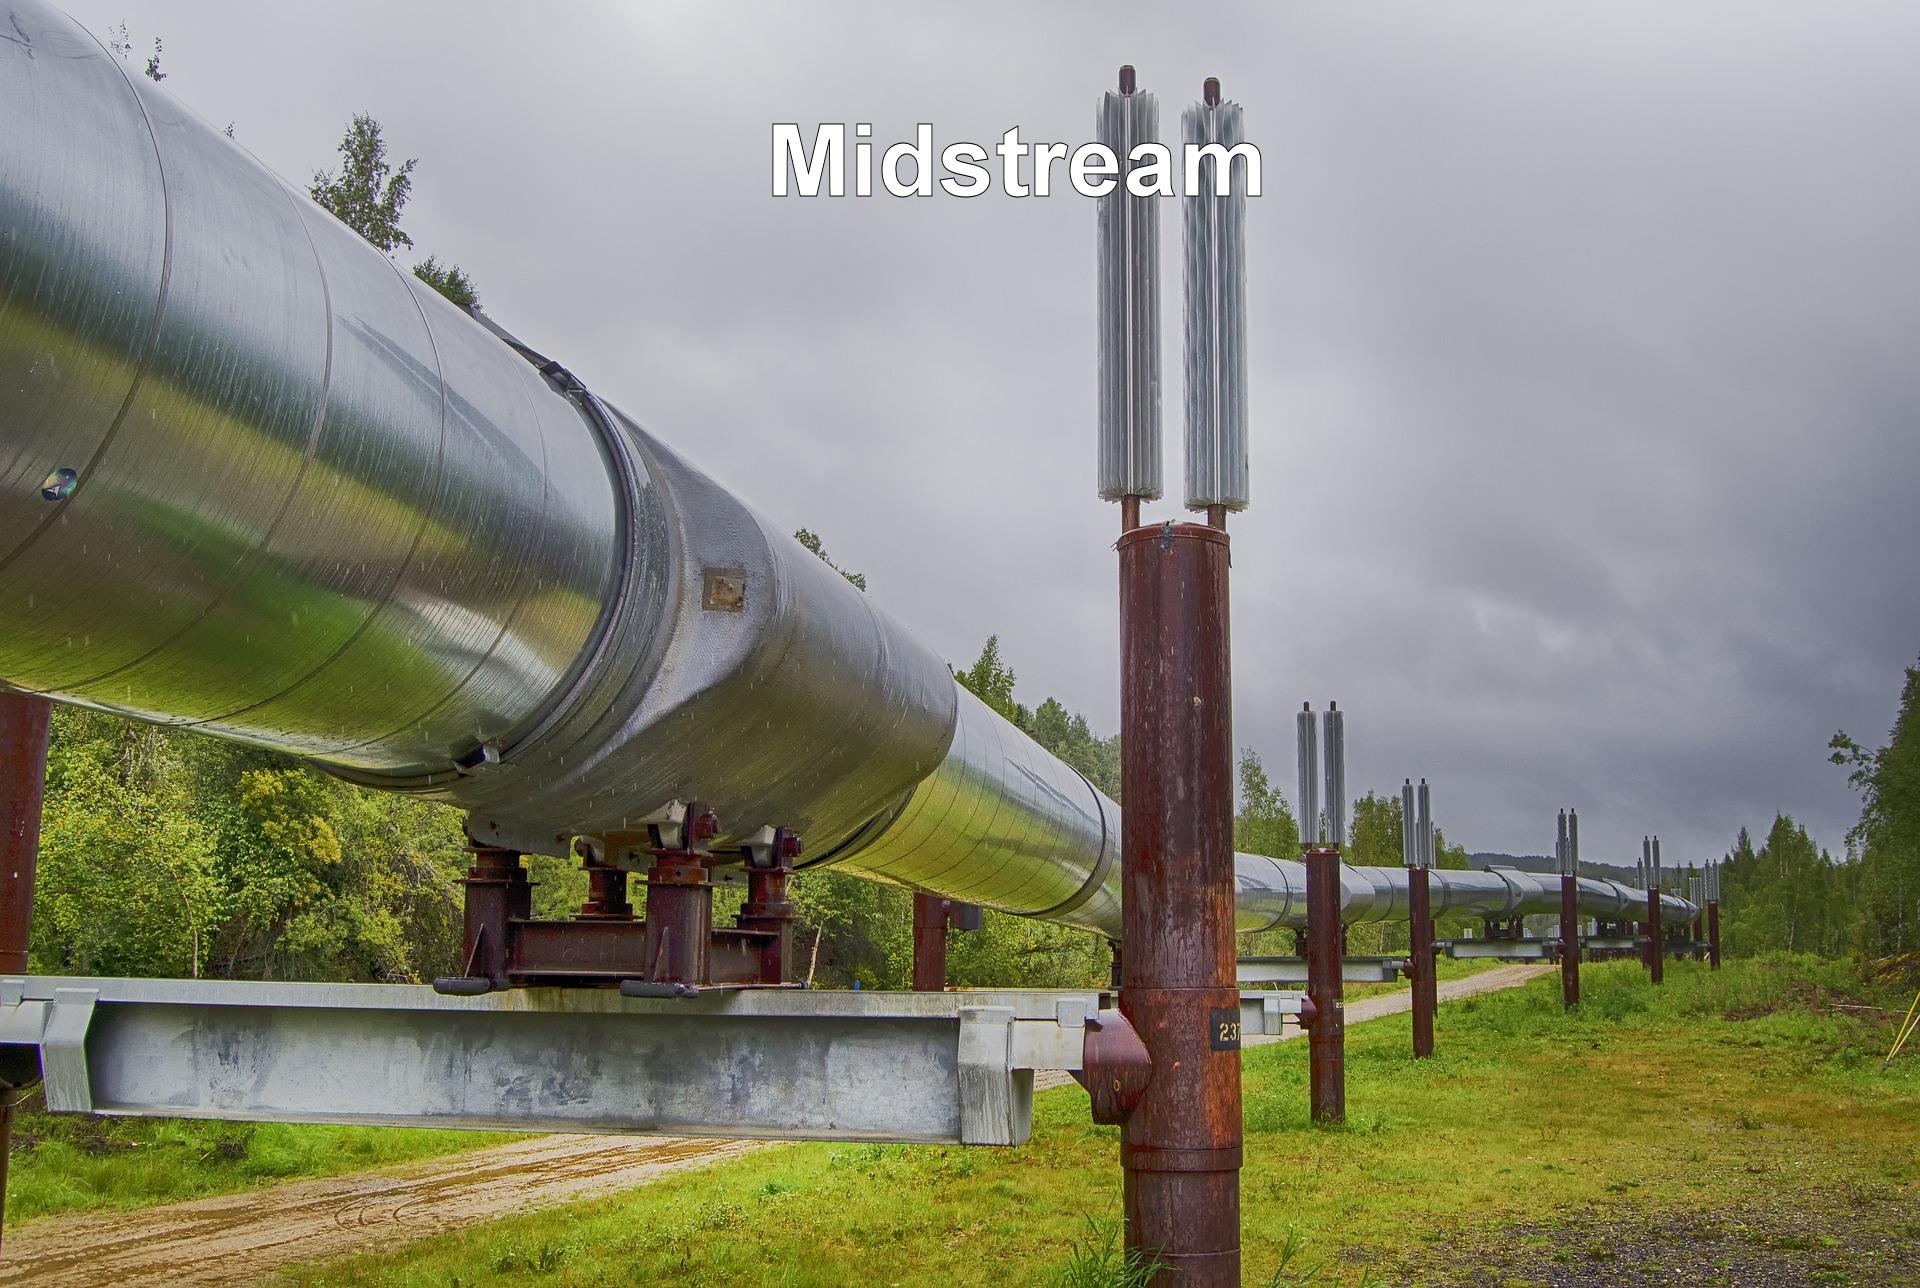 Midstream Oil & Gas